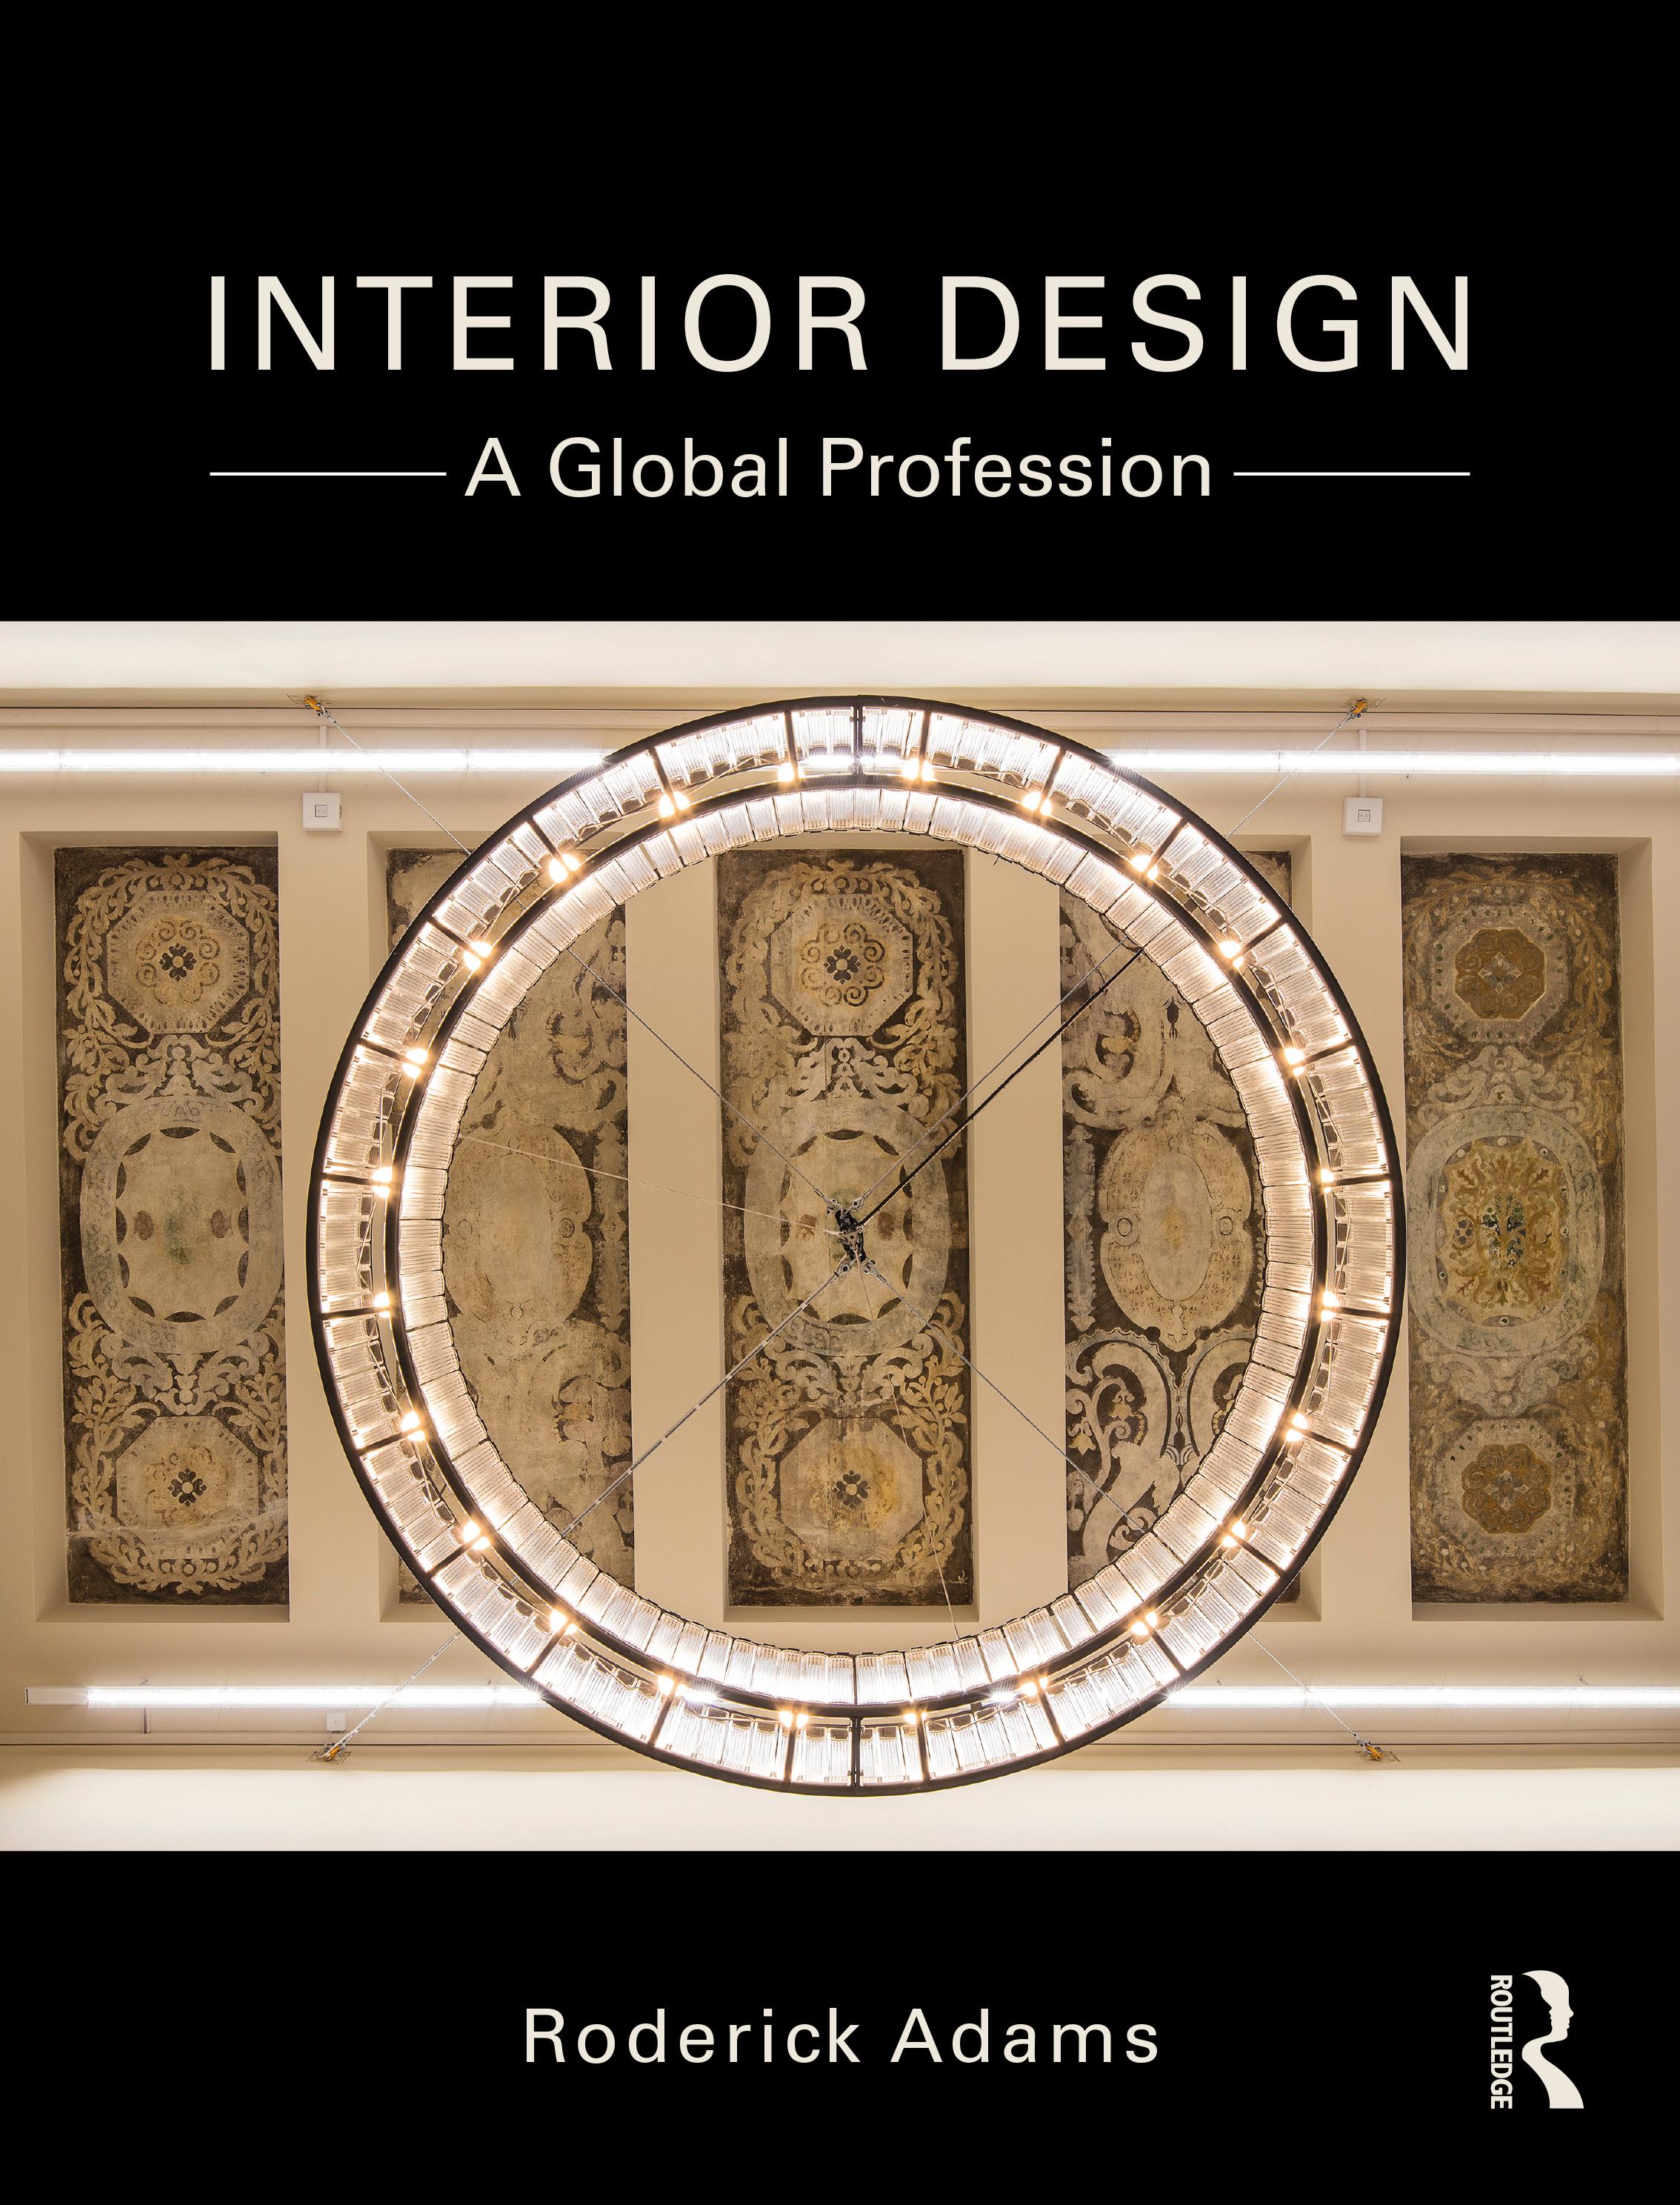 Interior Design: A Global Profession book cover